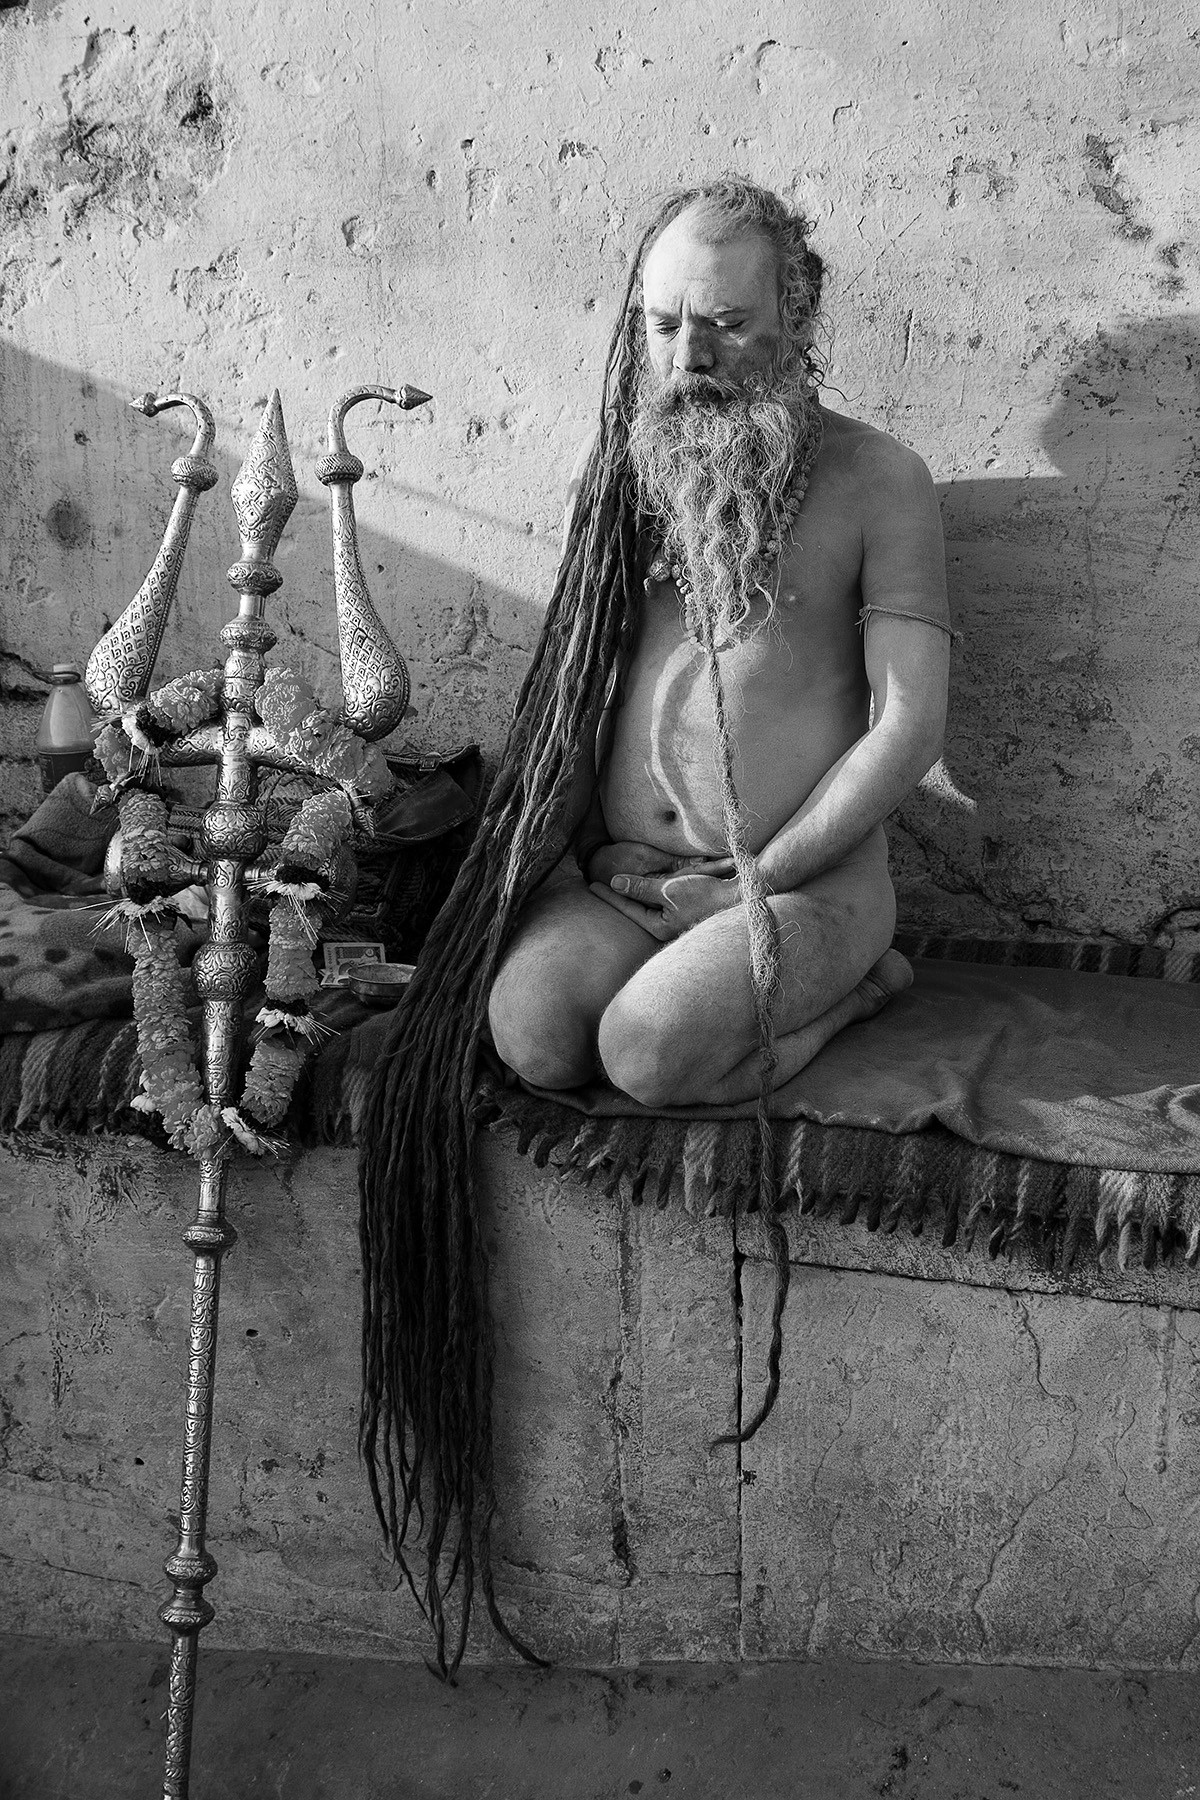 Banaras 06 by Arunkumar Mishra, Image Photograph, Digital Print on Paper, Gray color